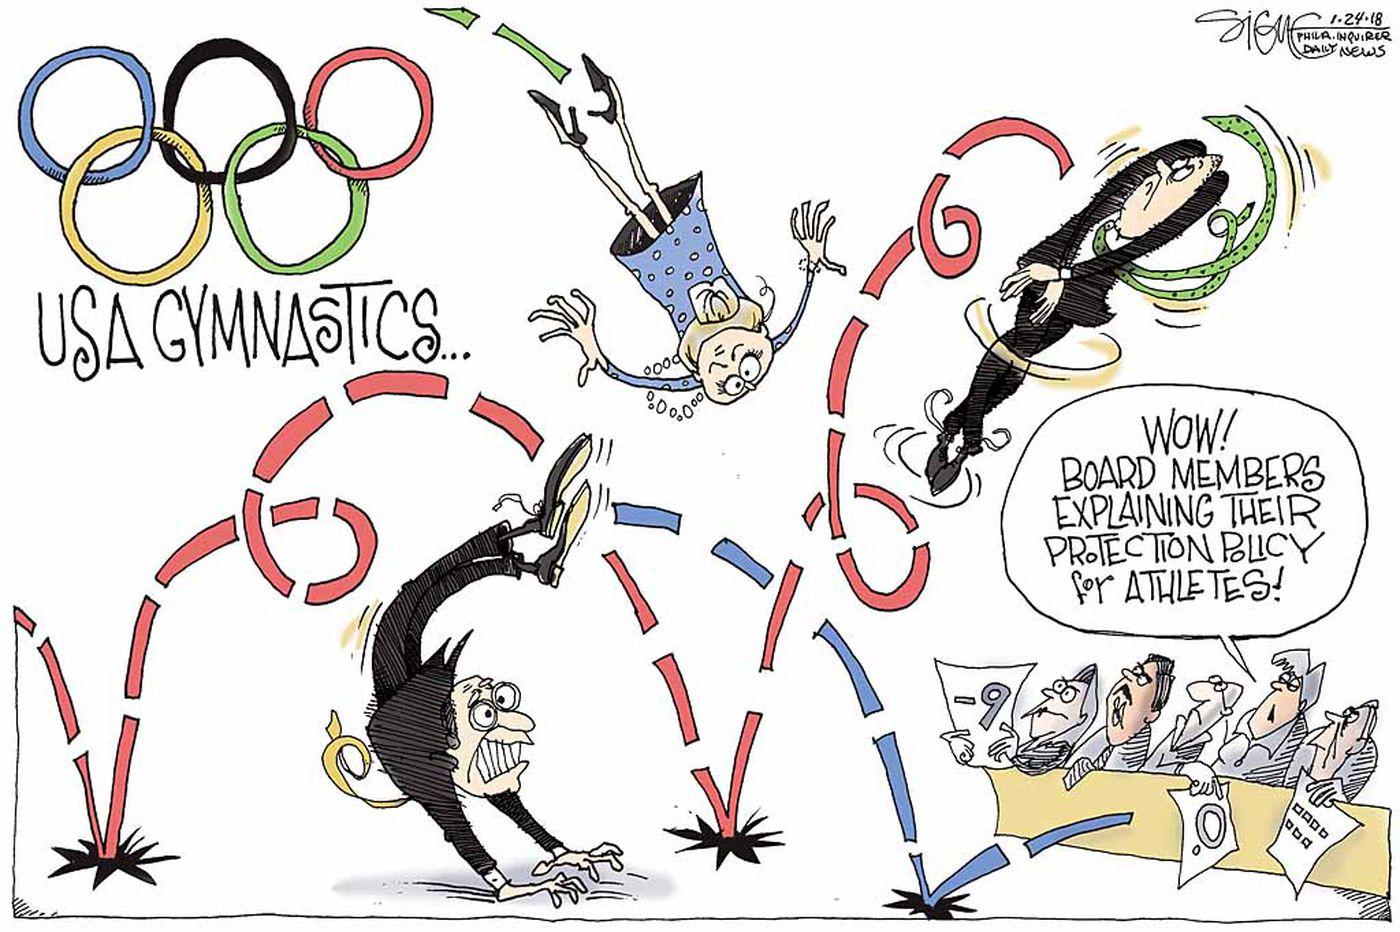 Daily Signe Cartoon 01/24/18